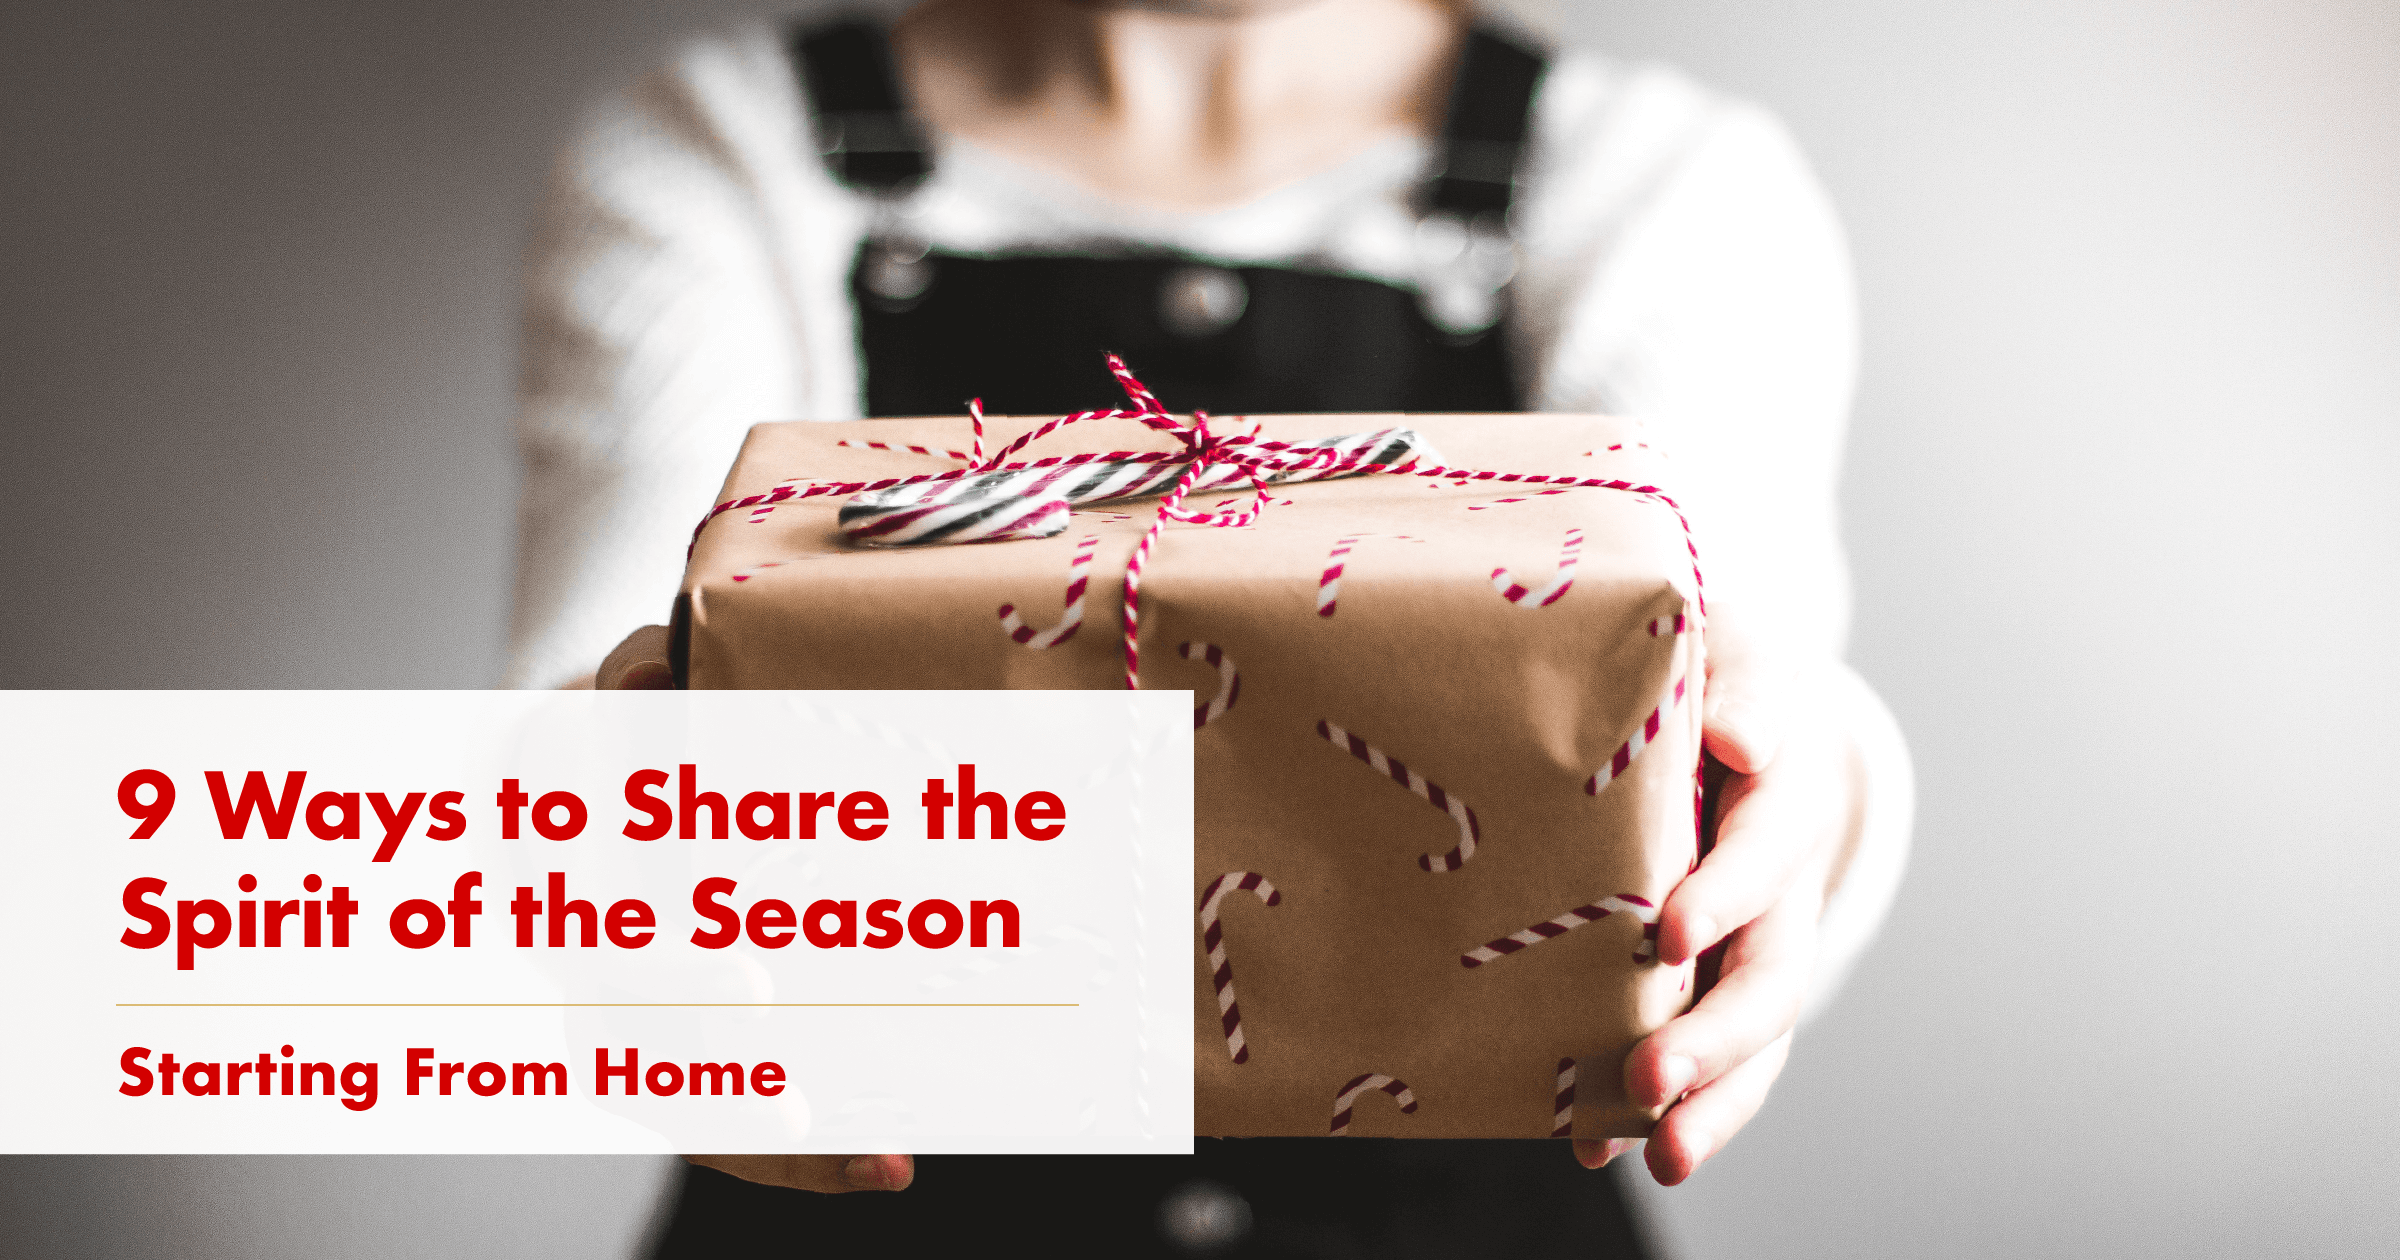 9 Ways to Share the Spirit of the Season